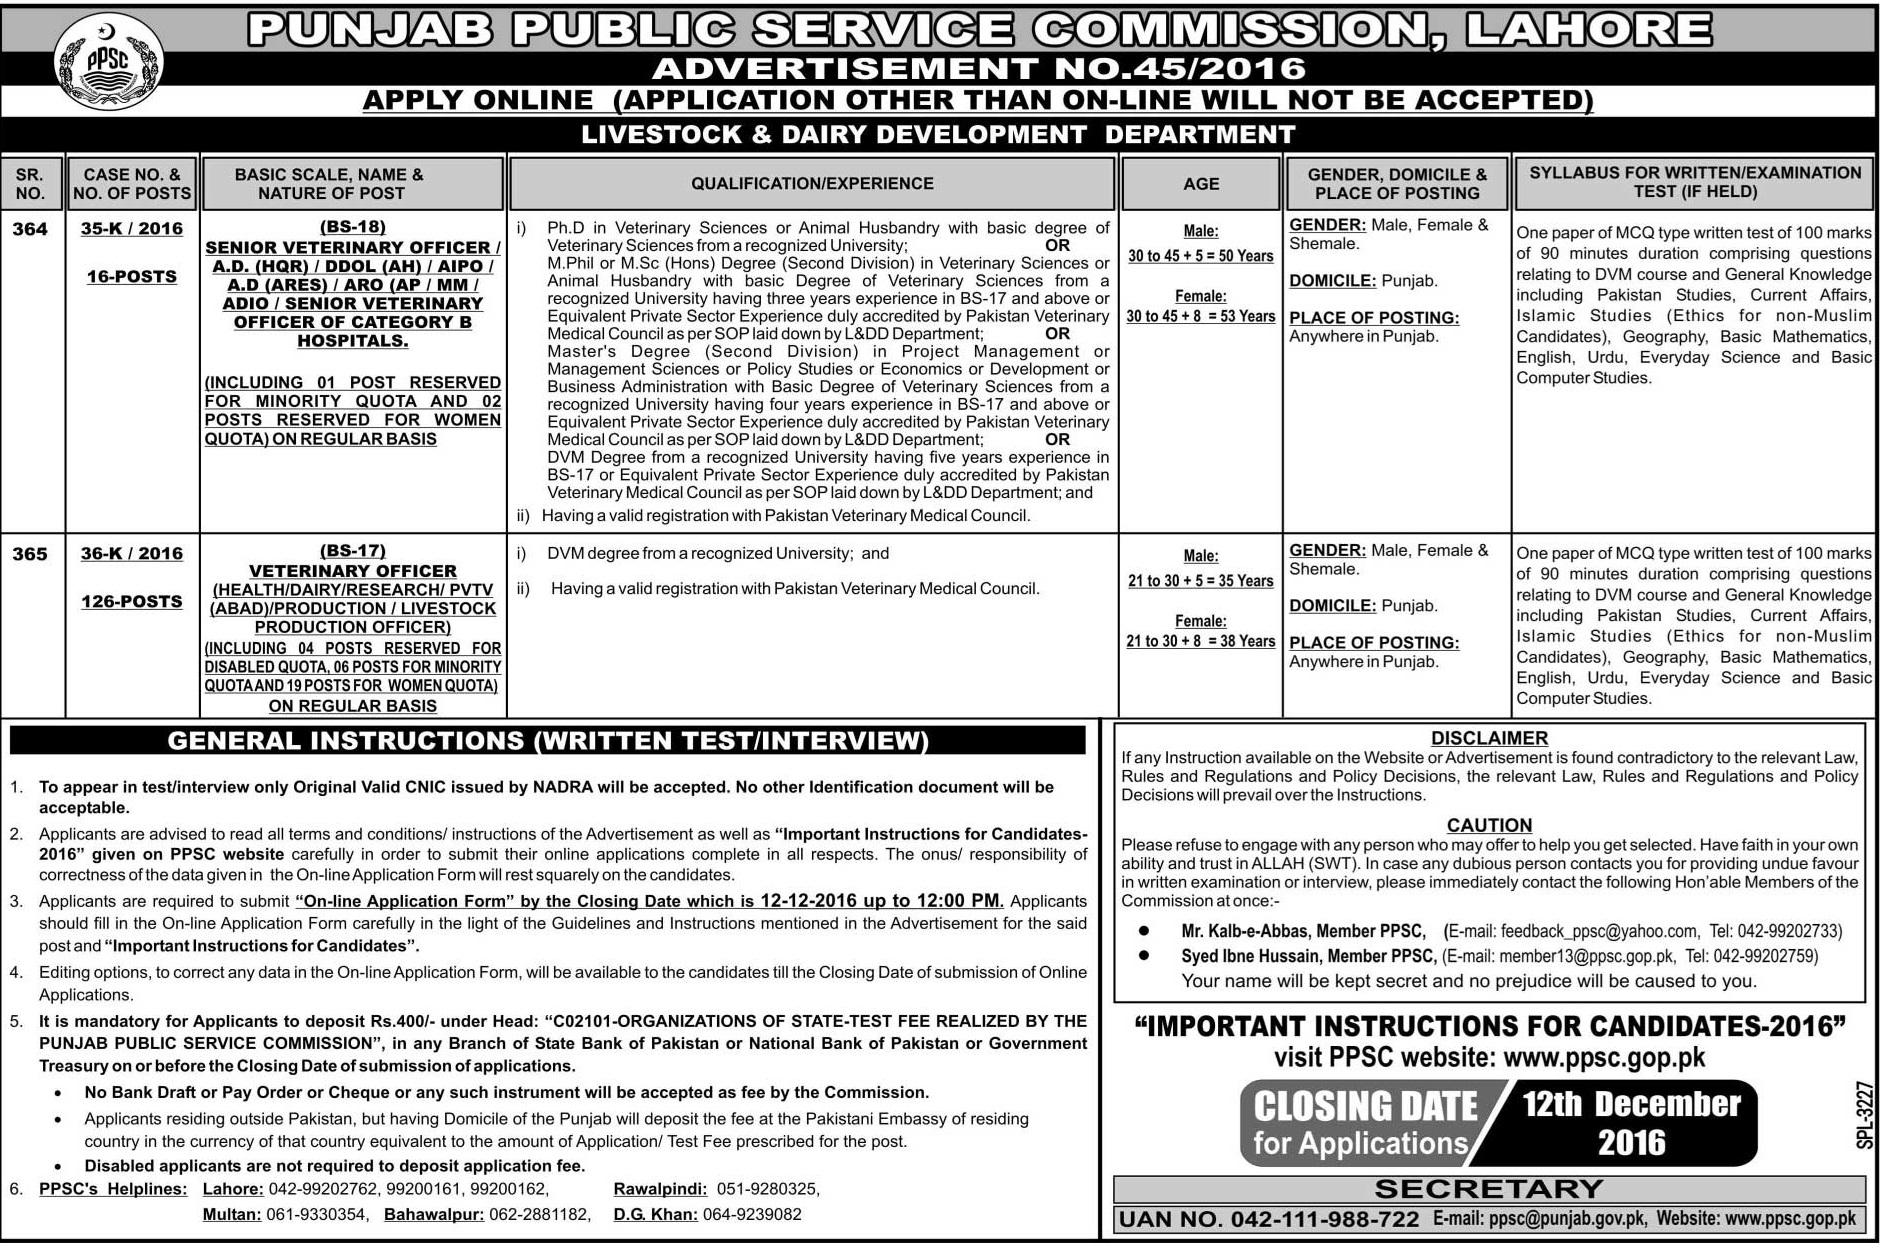 PPSC Veterinary Officer Jobs 2016 Apply Online Form, Advertisement, Last Date